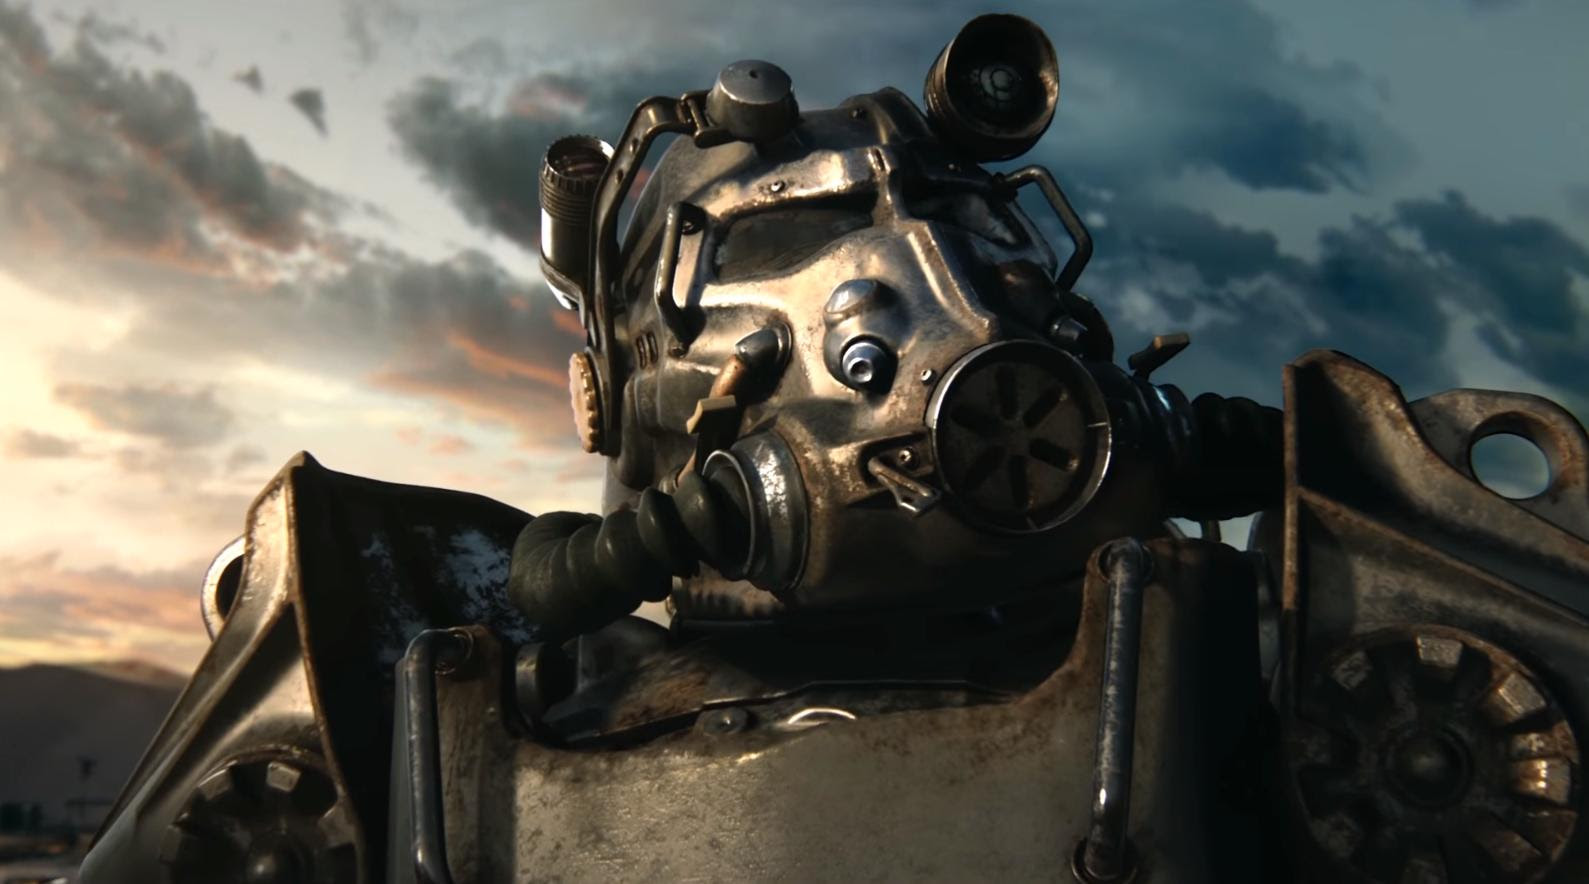 A Few Fallout 4 Wanderer Trailer 1080p Screencap Wallpapers Fo4